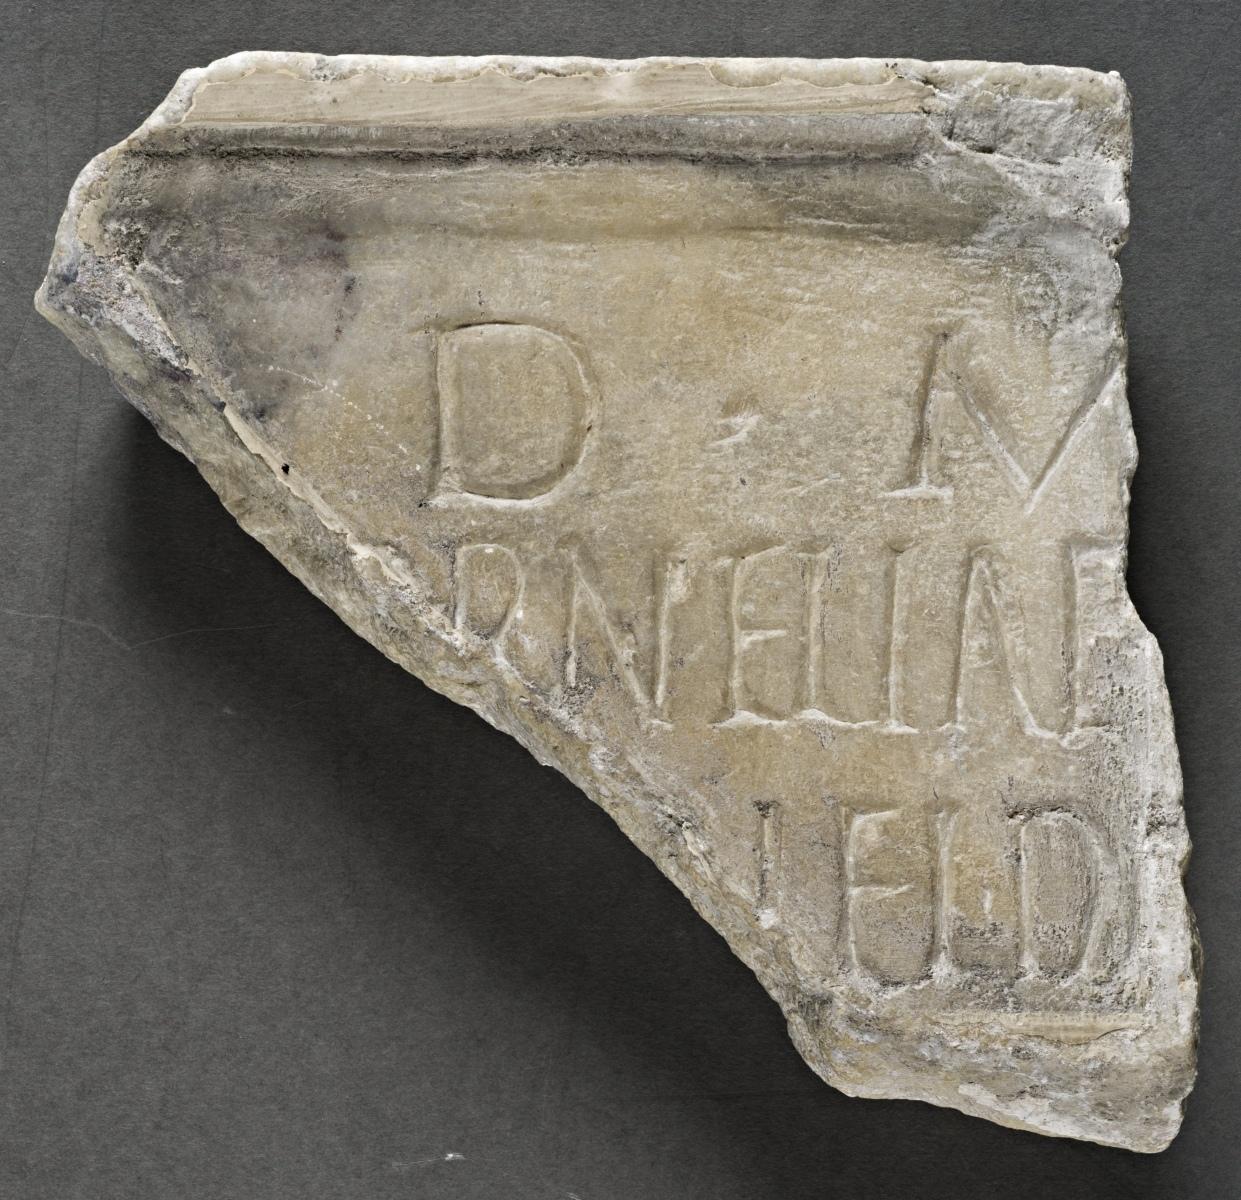 Fragmentary plaque from the tomb of Cornelia